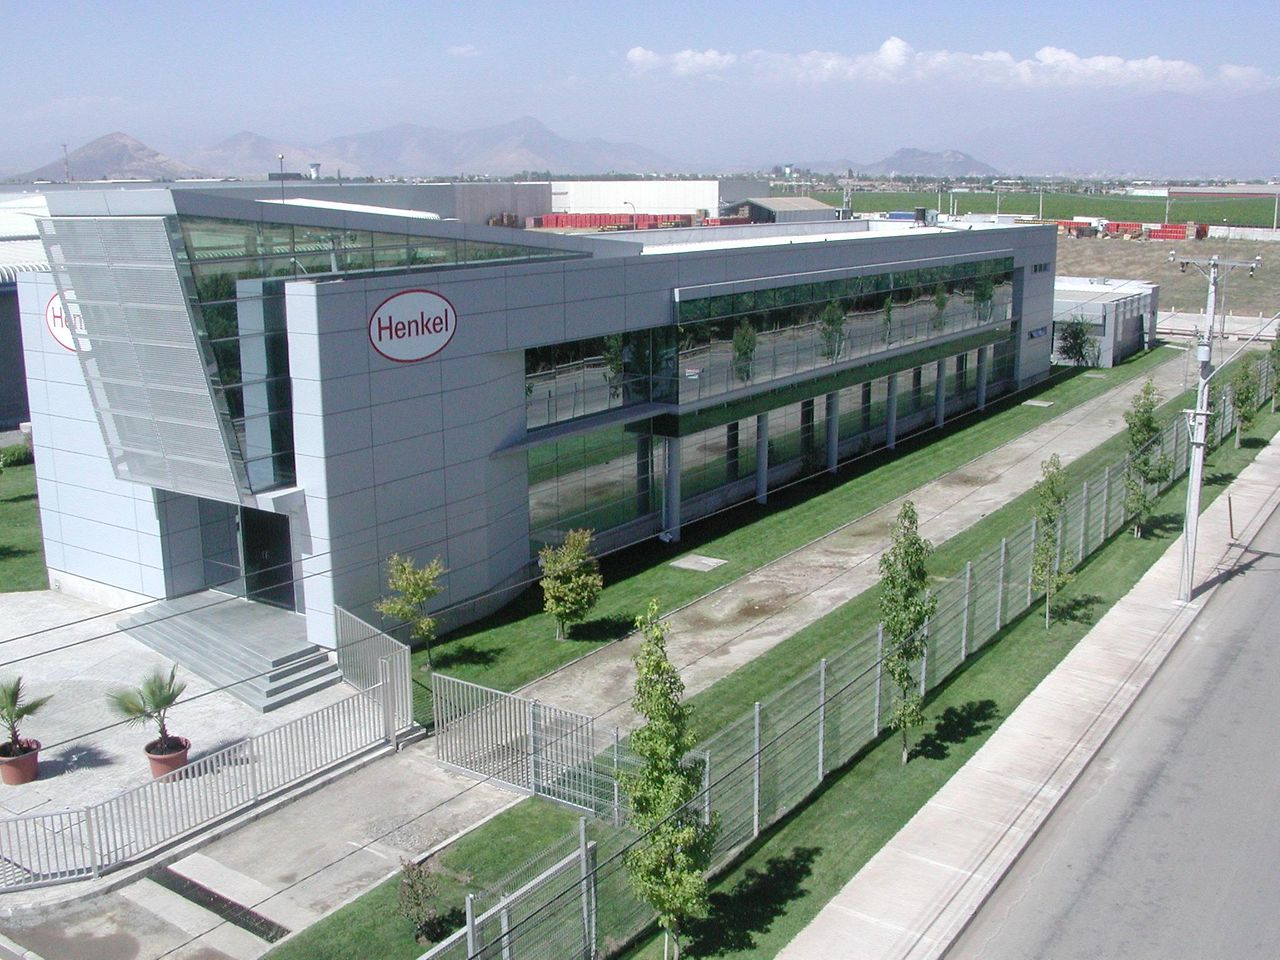 Site in Santiago, Chile